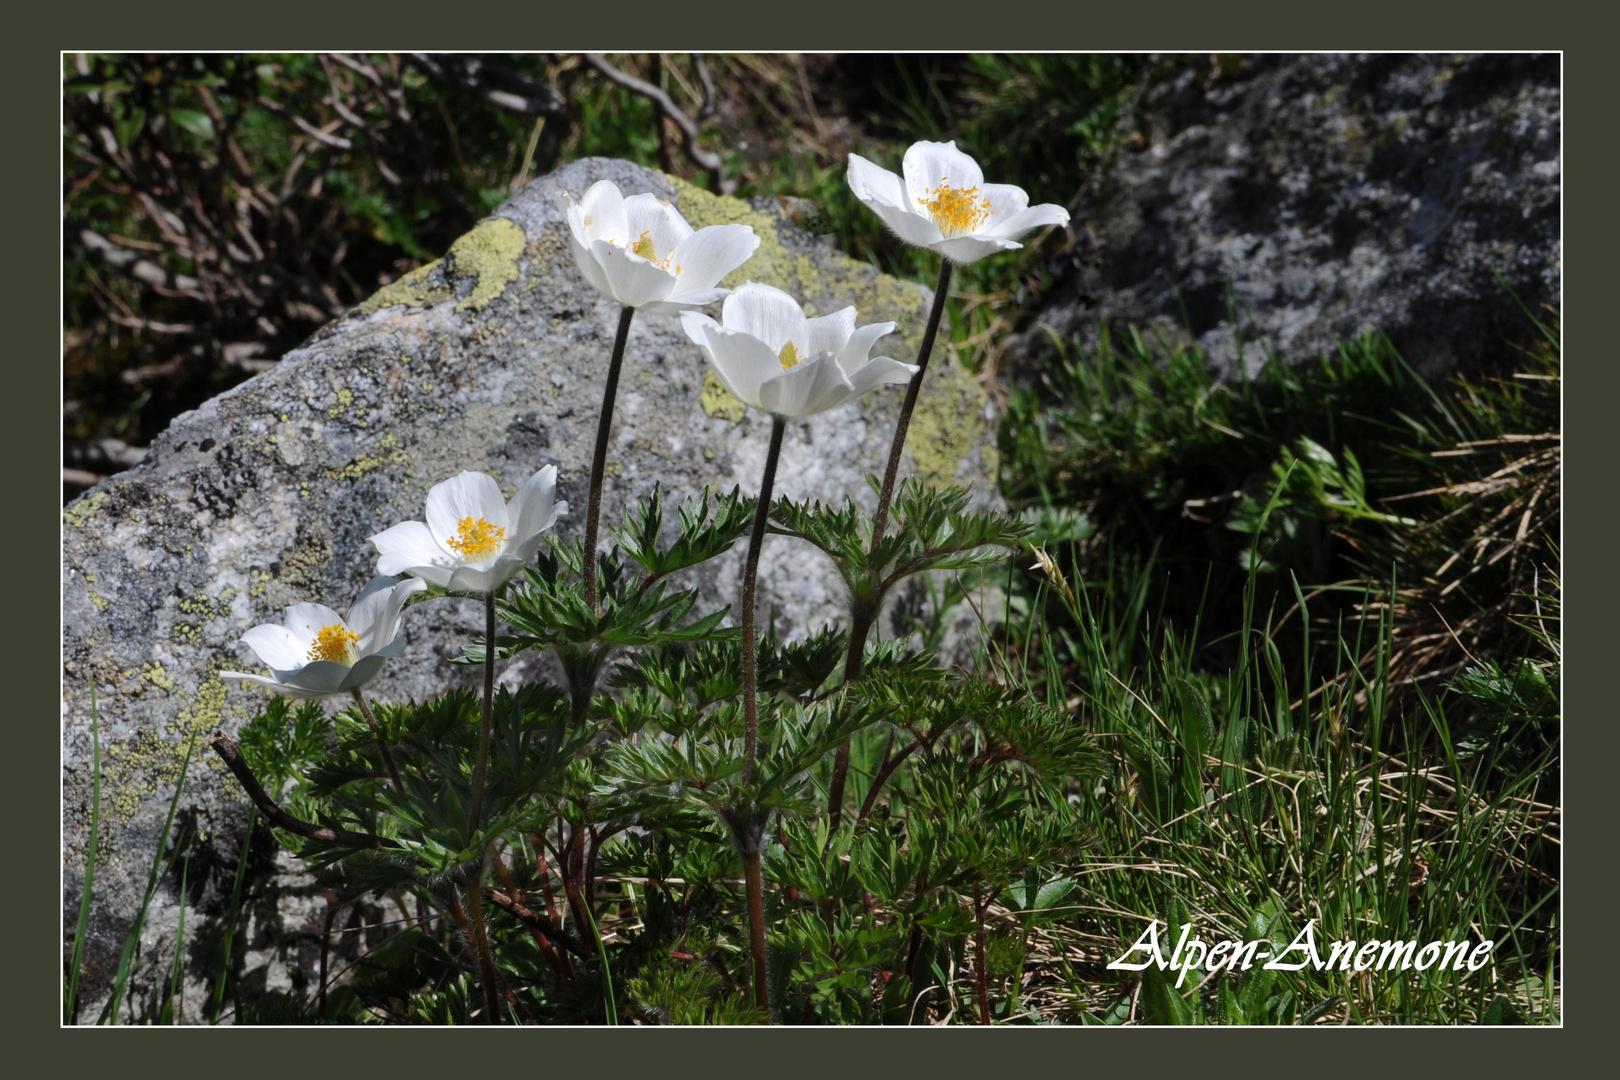 Alpen-Anemone